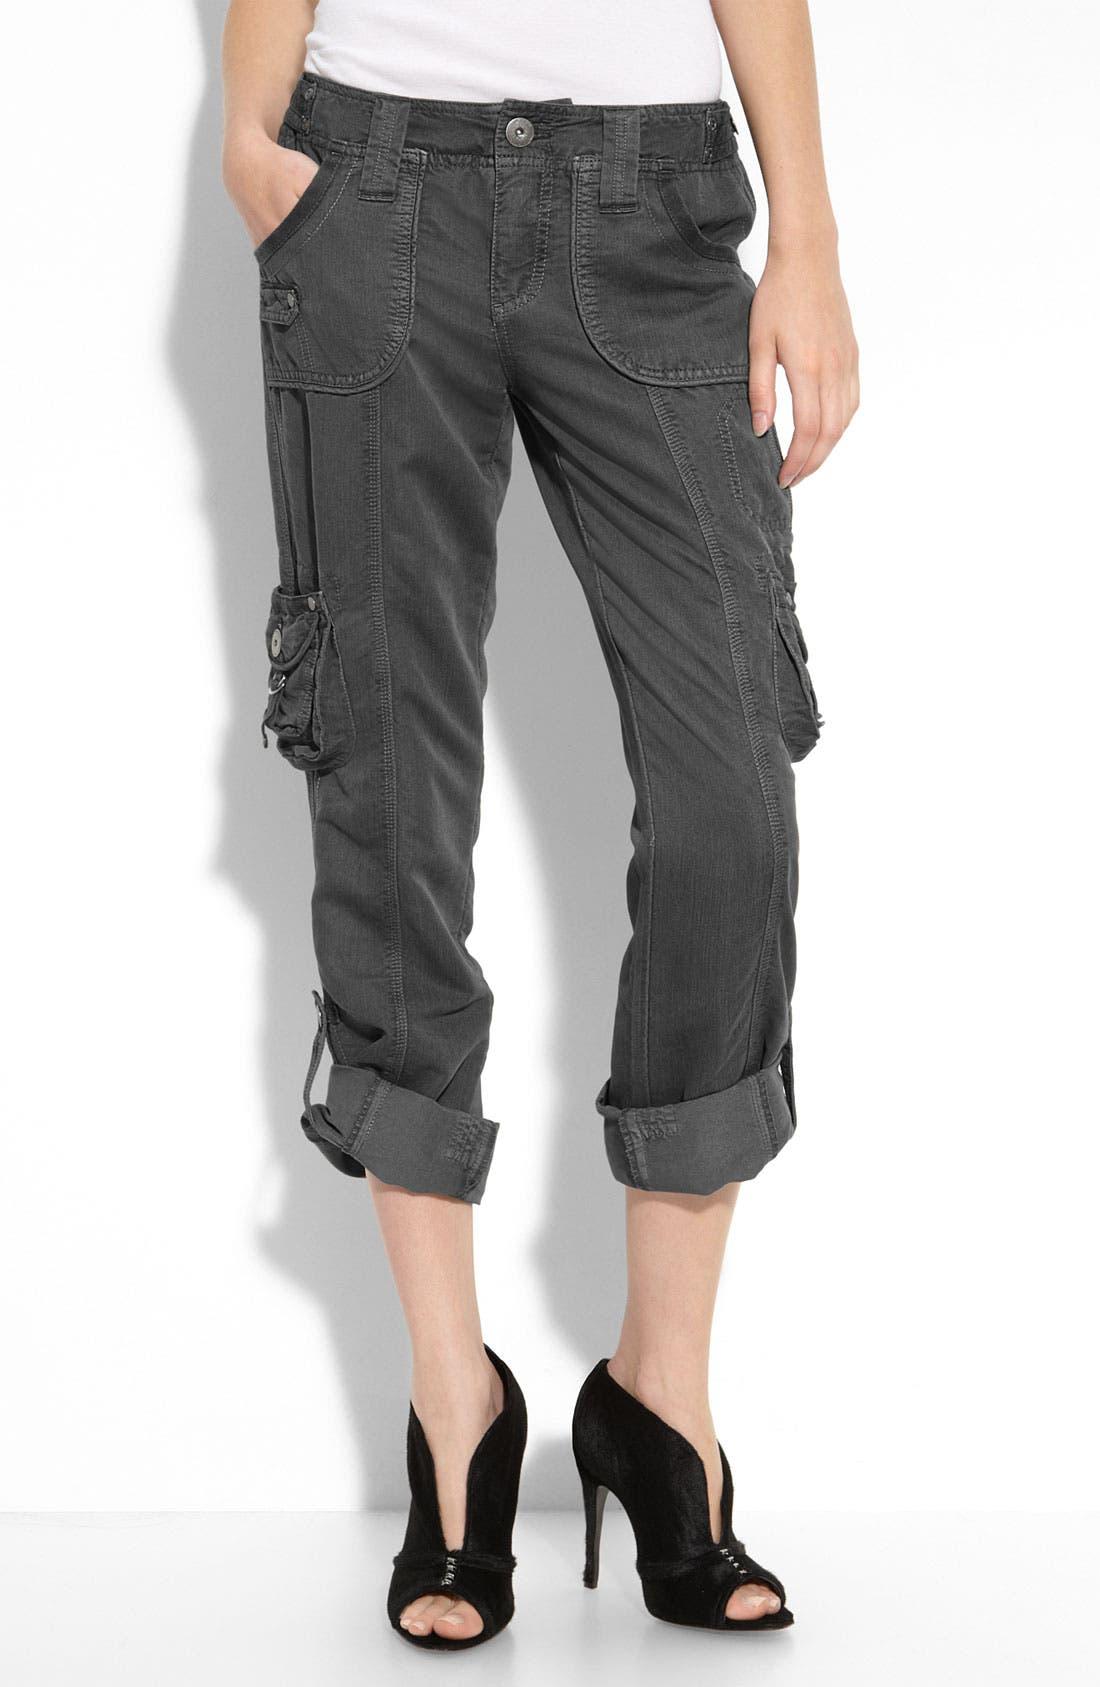 Alternate Image 1 Selected - Marrakech 'Pheobe' Pants